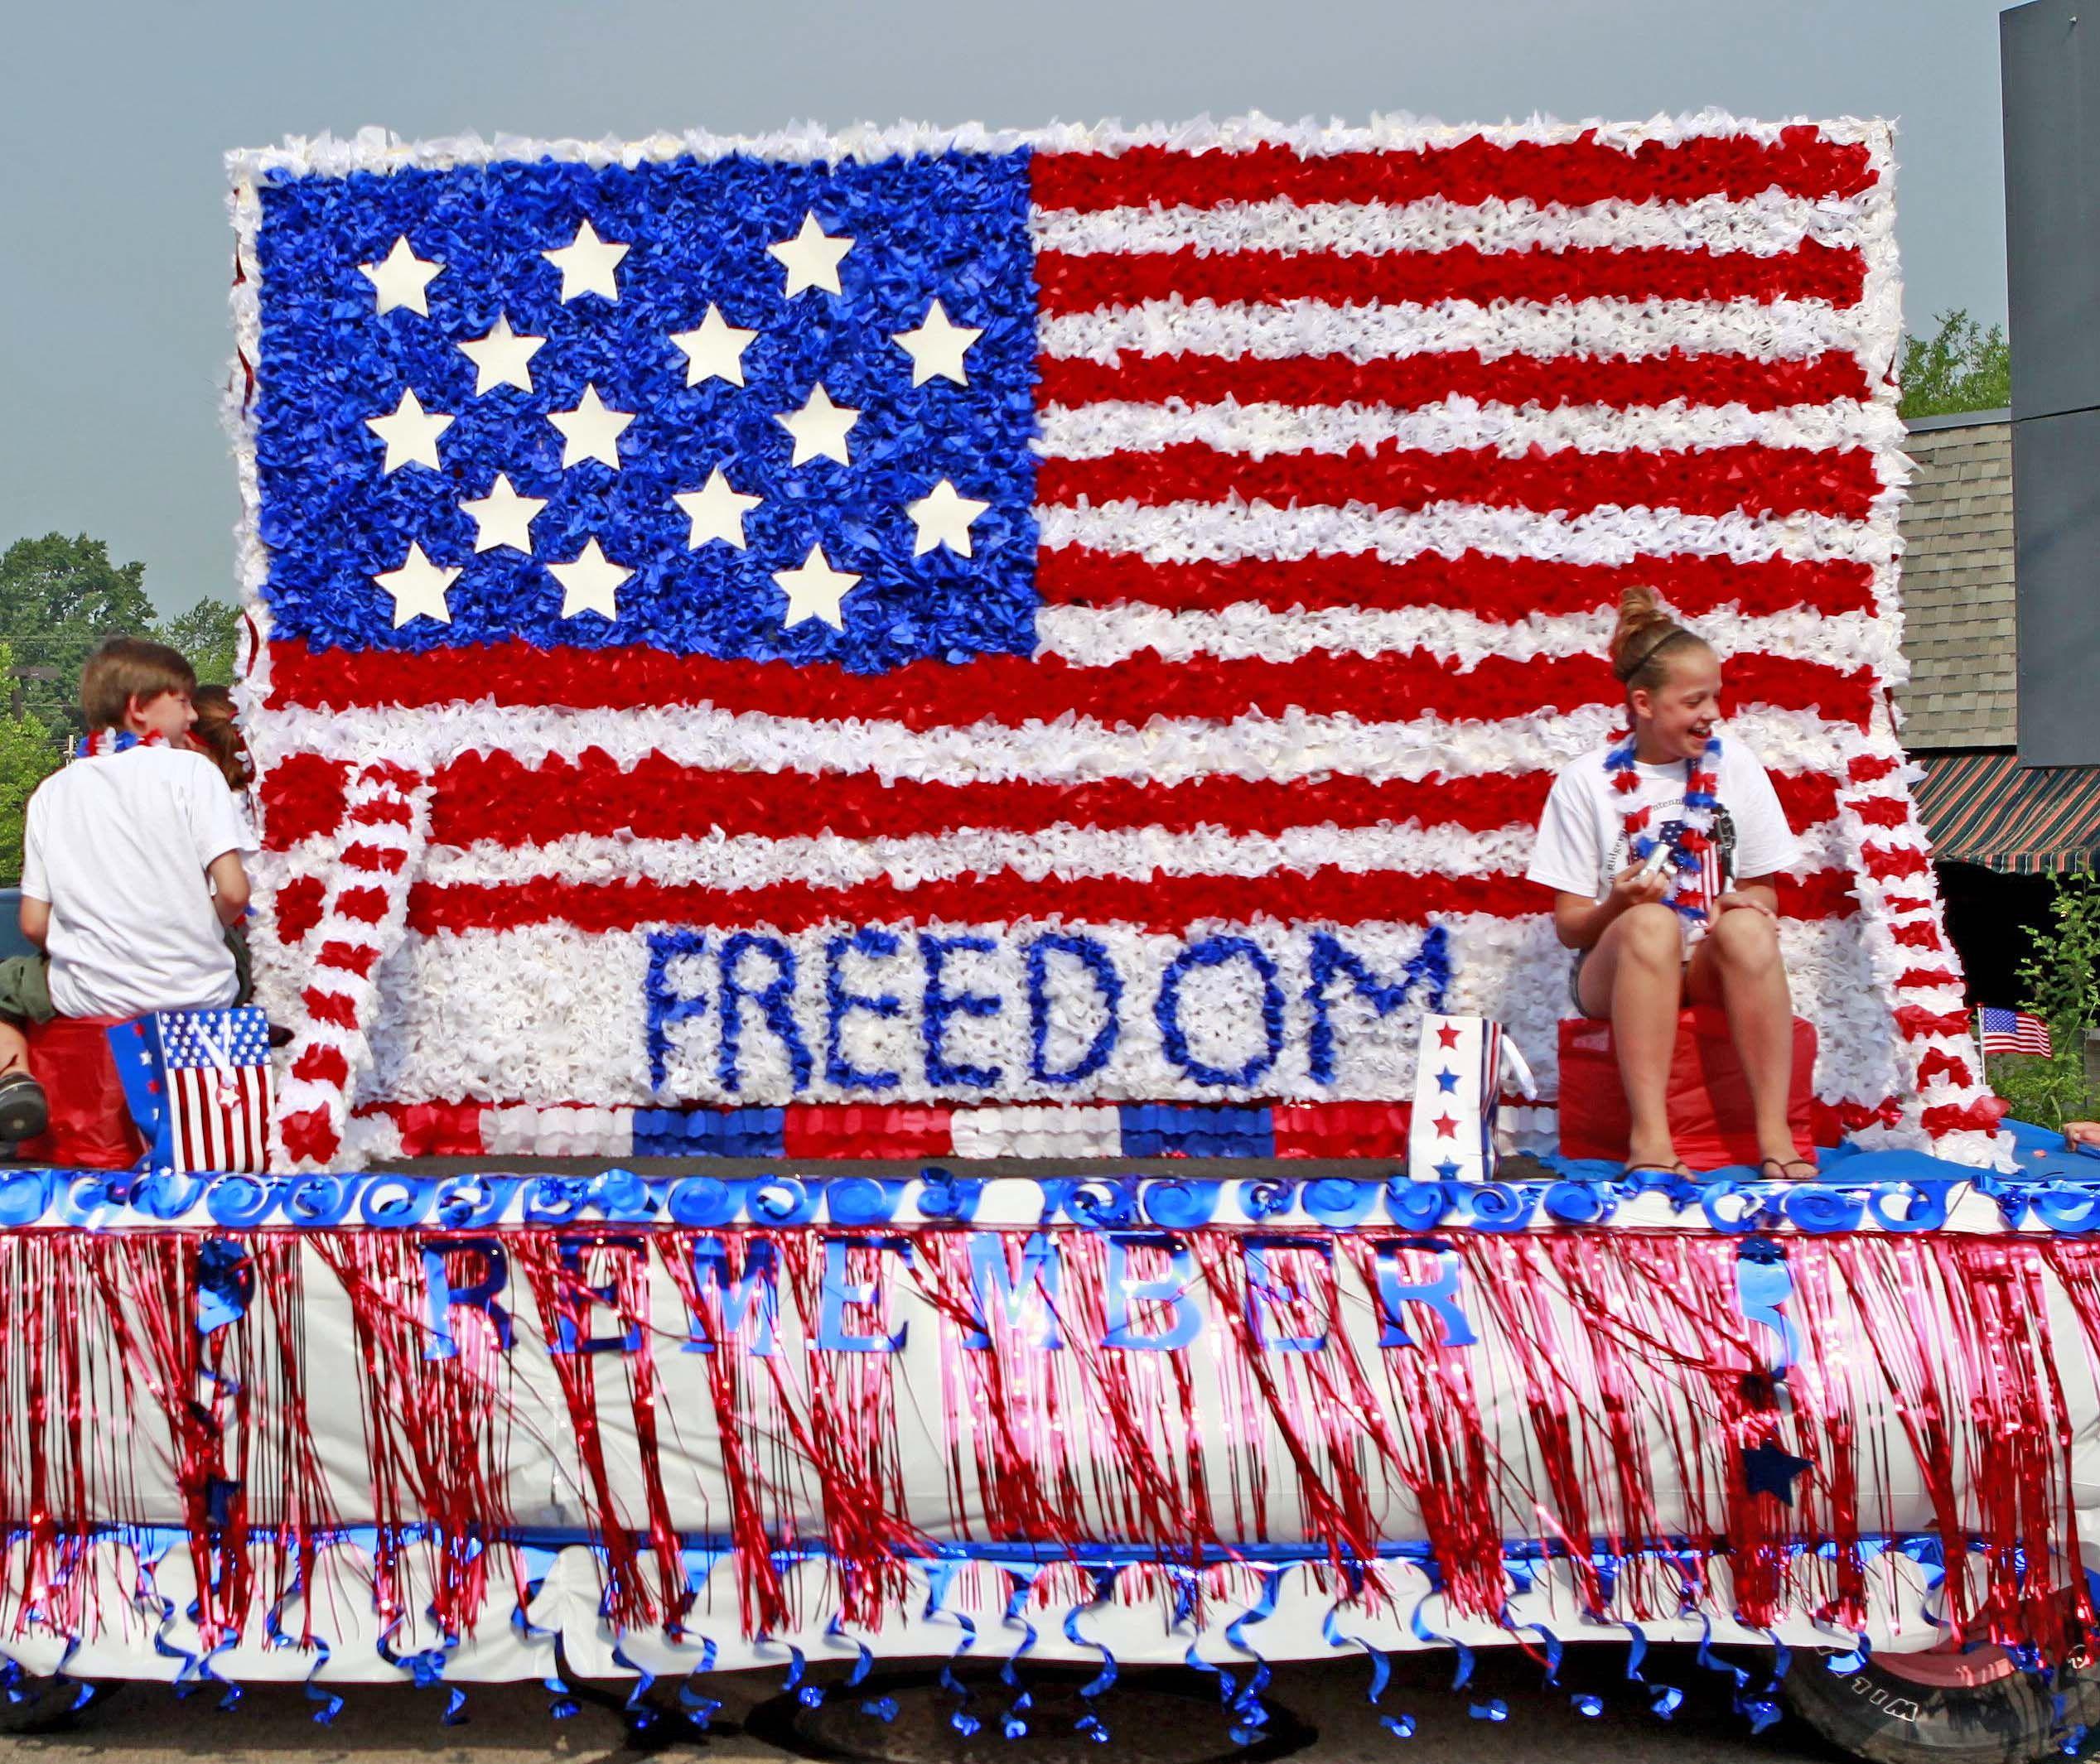 Avon memorial day parade details released